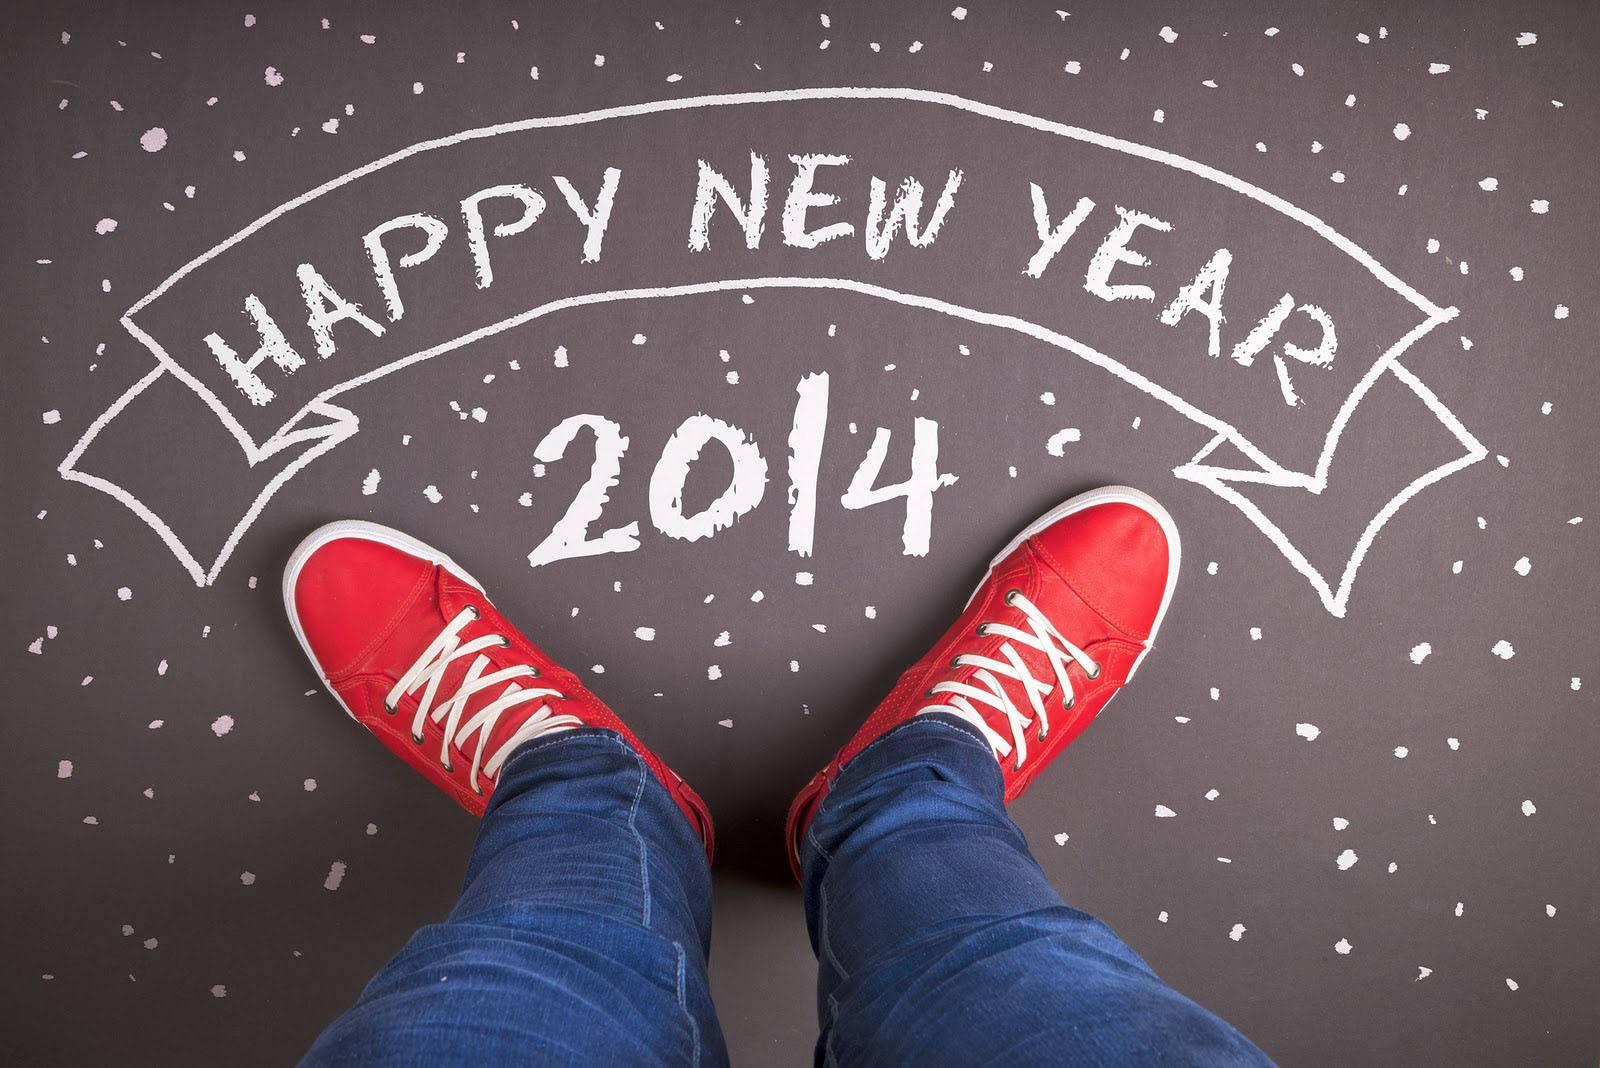 7-new-year-wallpaper-2014